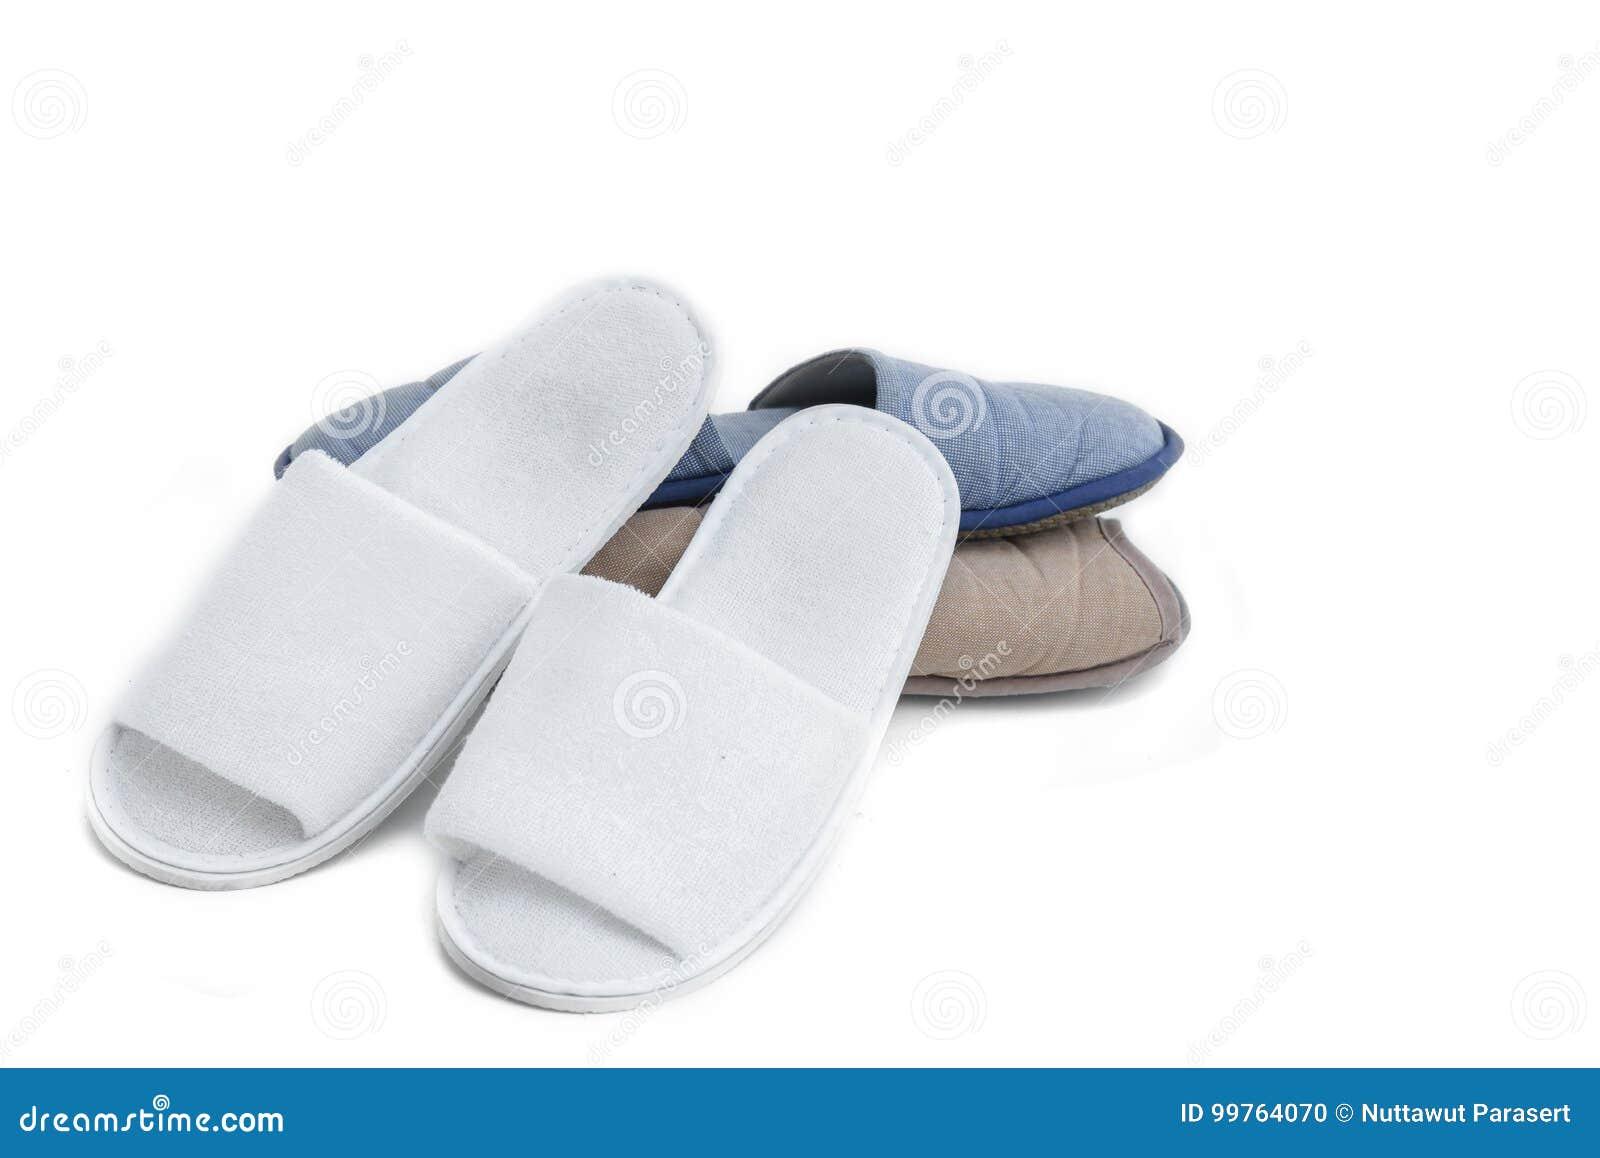 5893e7756ba White Textile Home Slippers Isolated On White Background Stock Photo ...